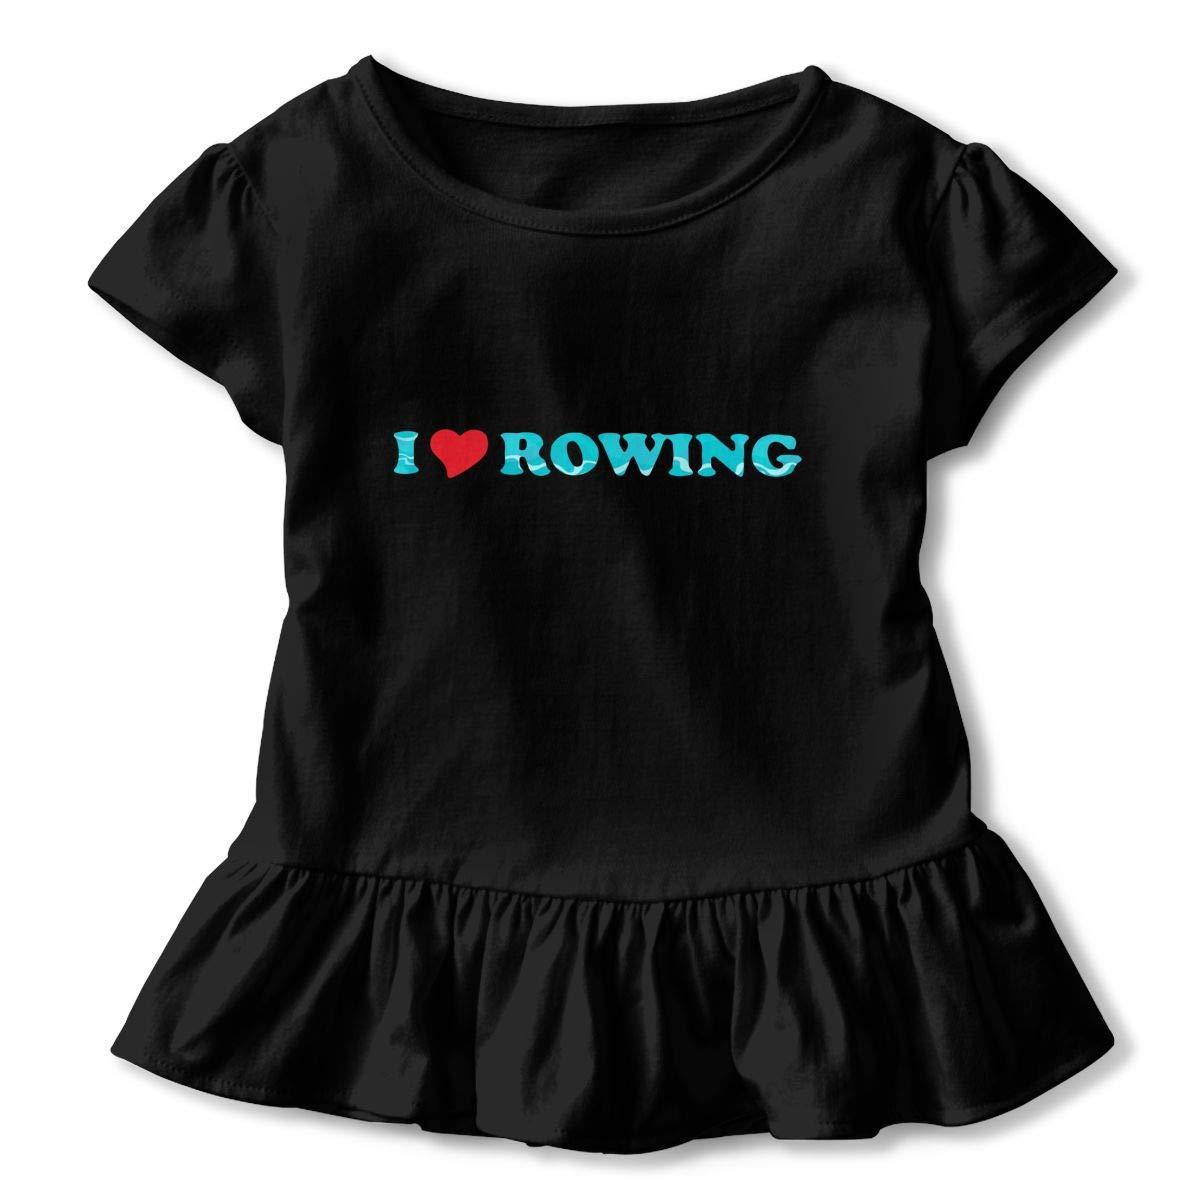 I Love Rowing Heart Toddler Baby Girls Short Sleeve Ruffle T-Shirt